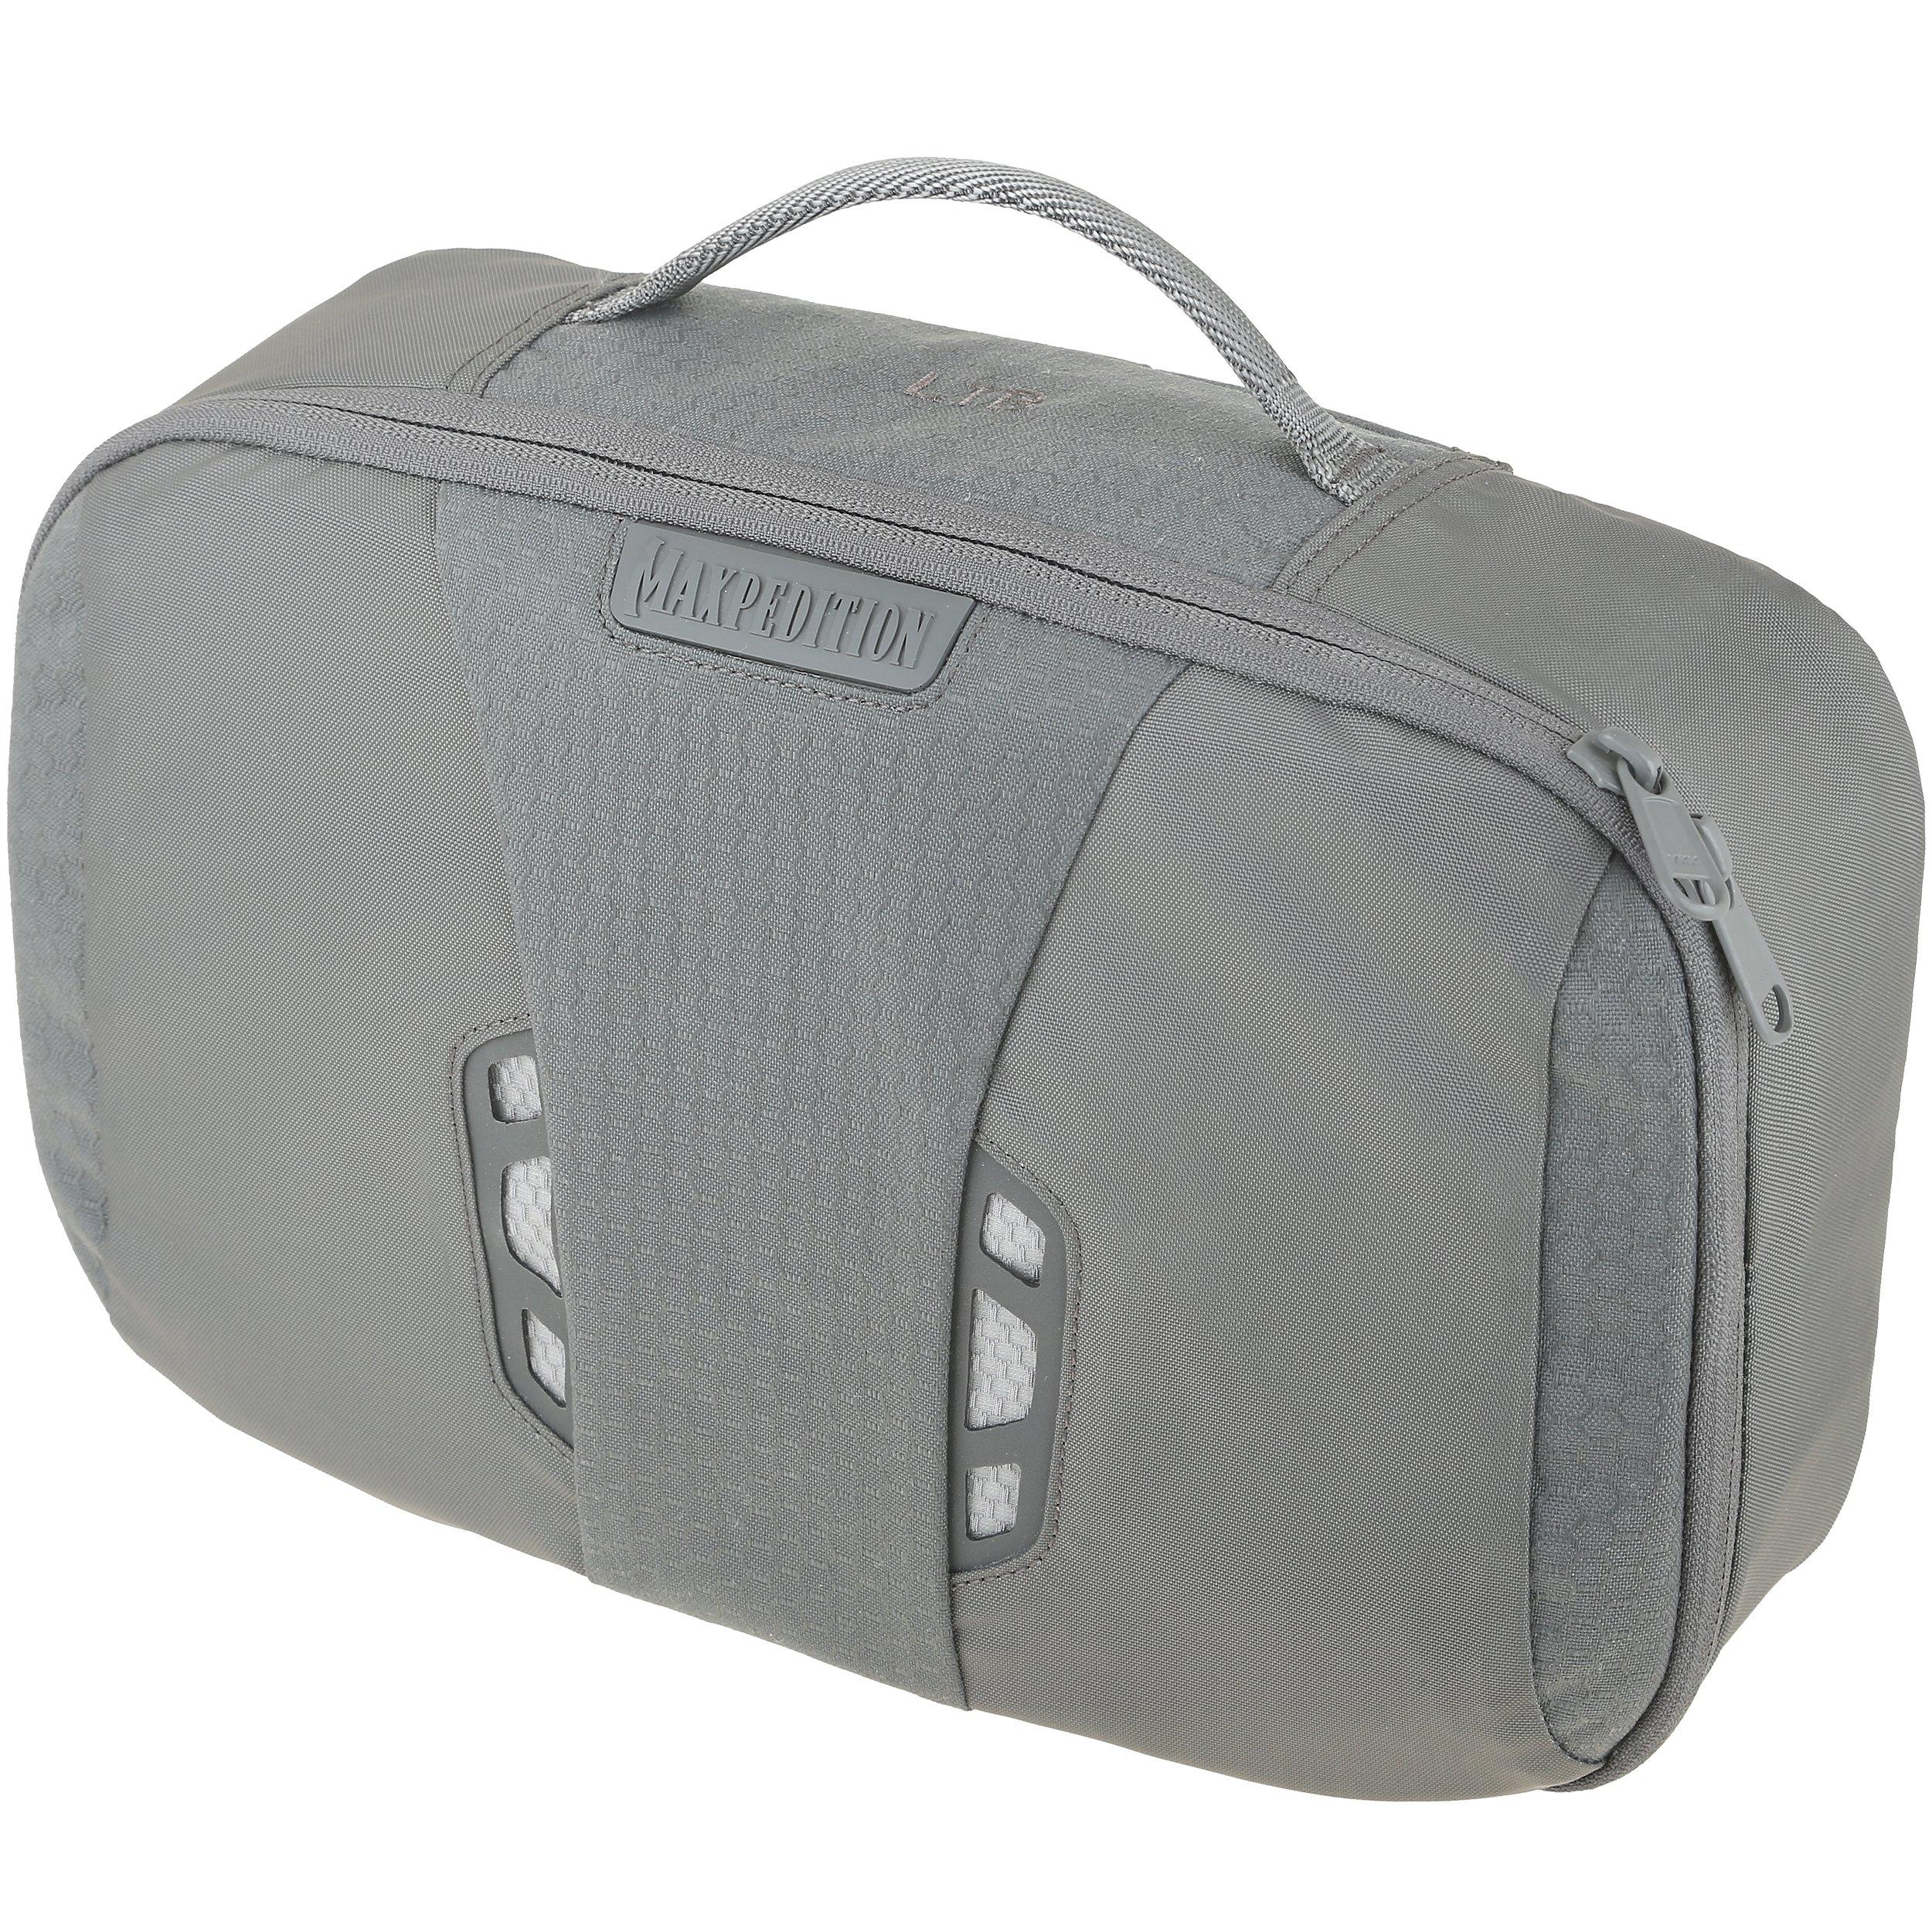 MXLTBGRY-BRK Lightweight Toiletry Bag Gray